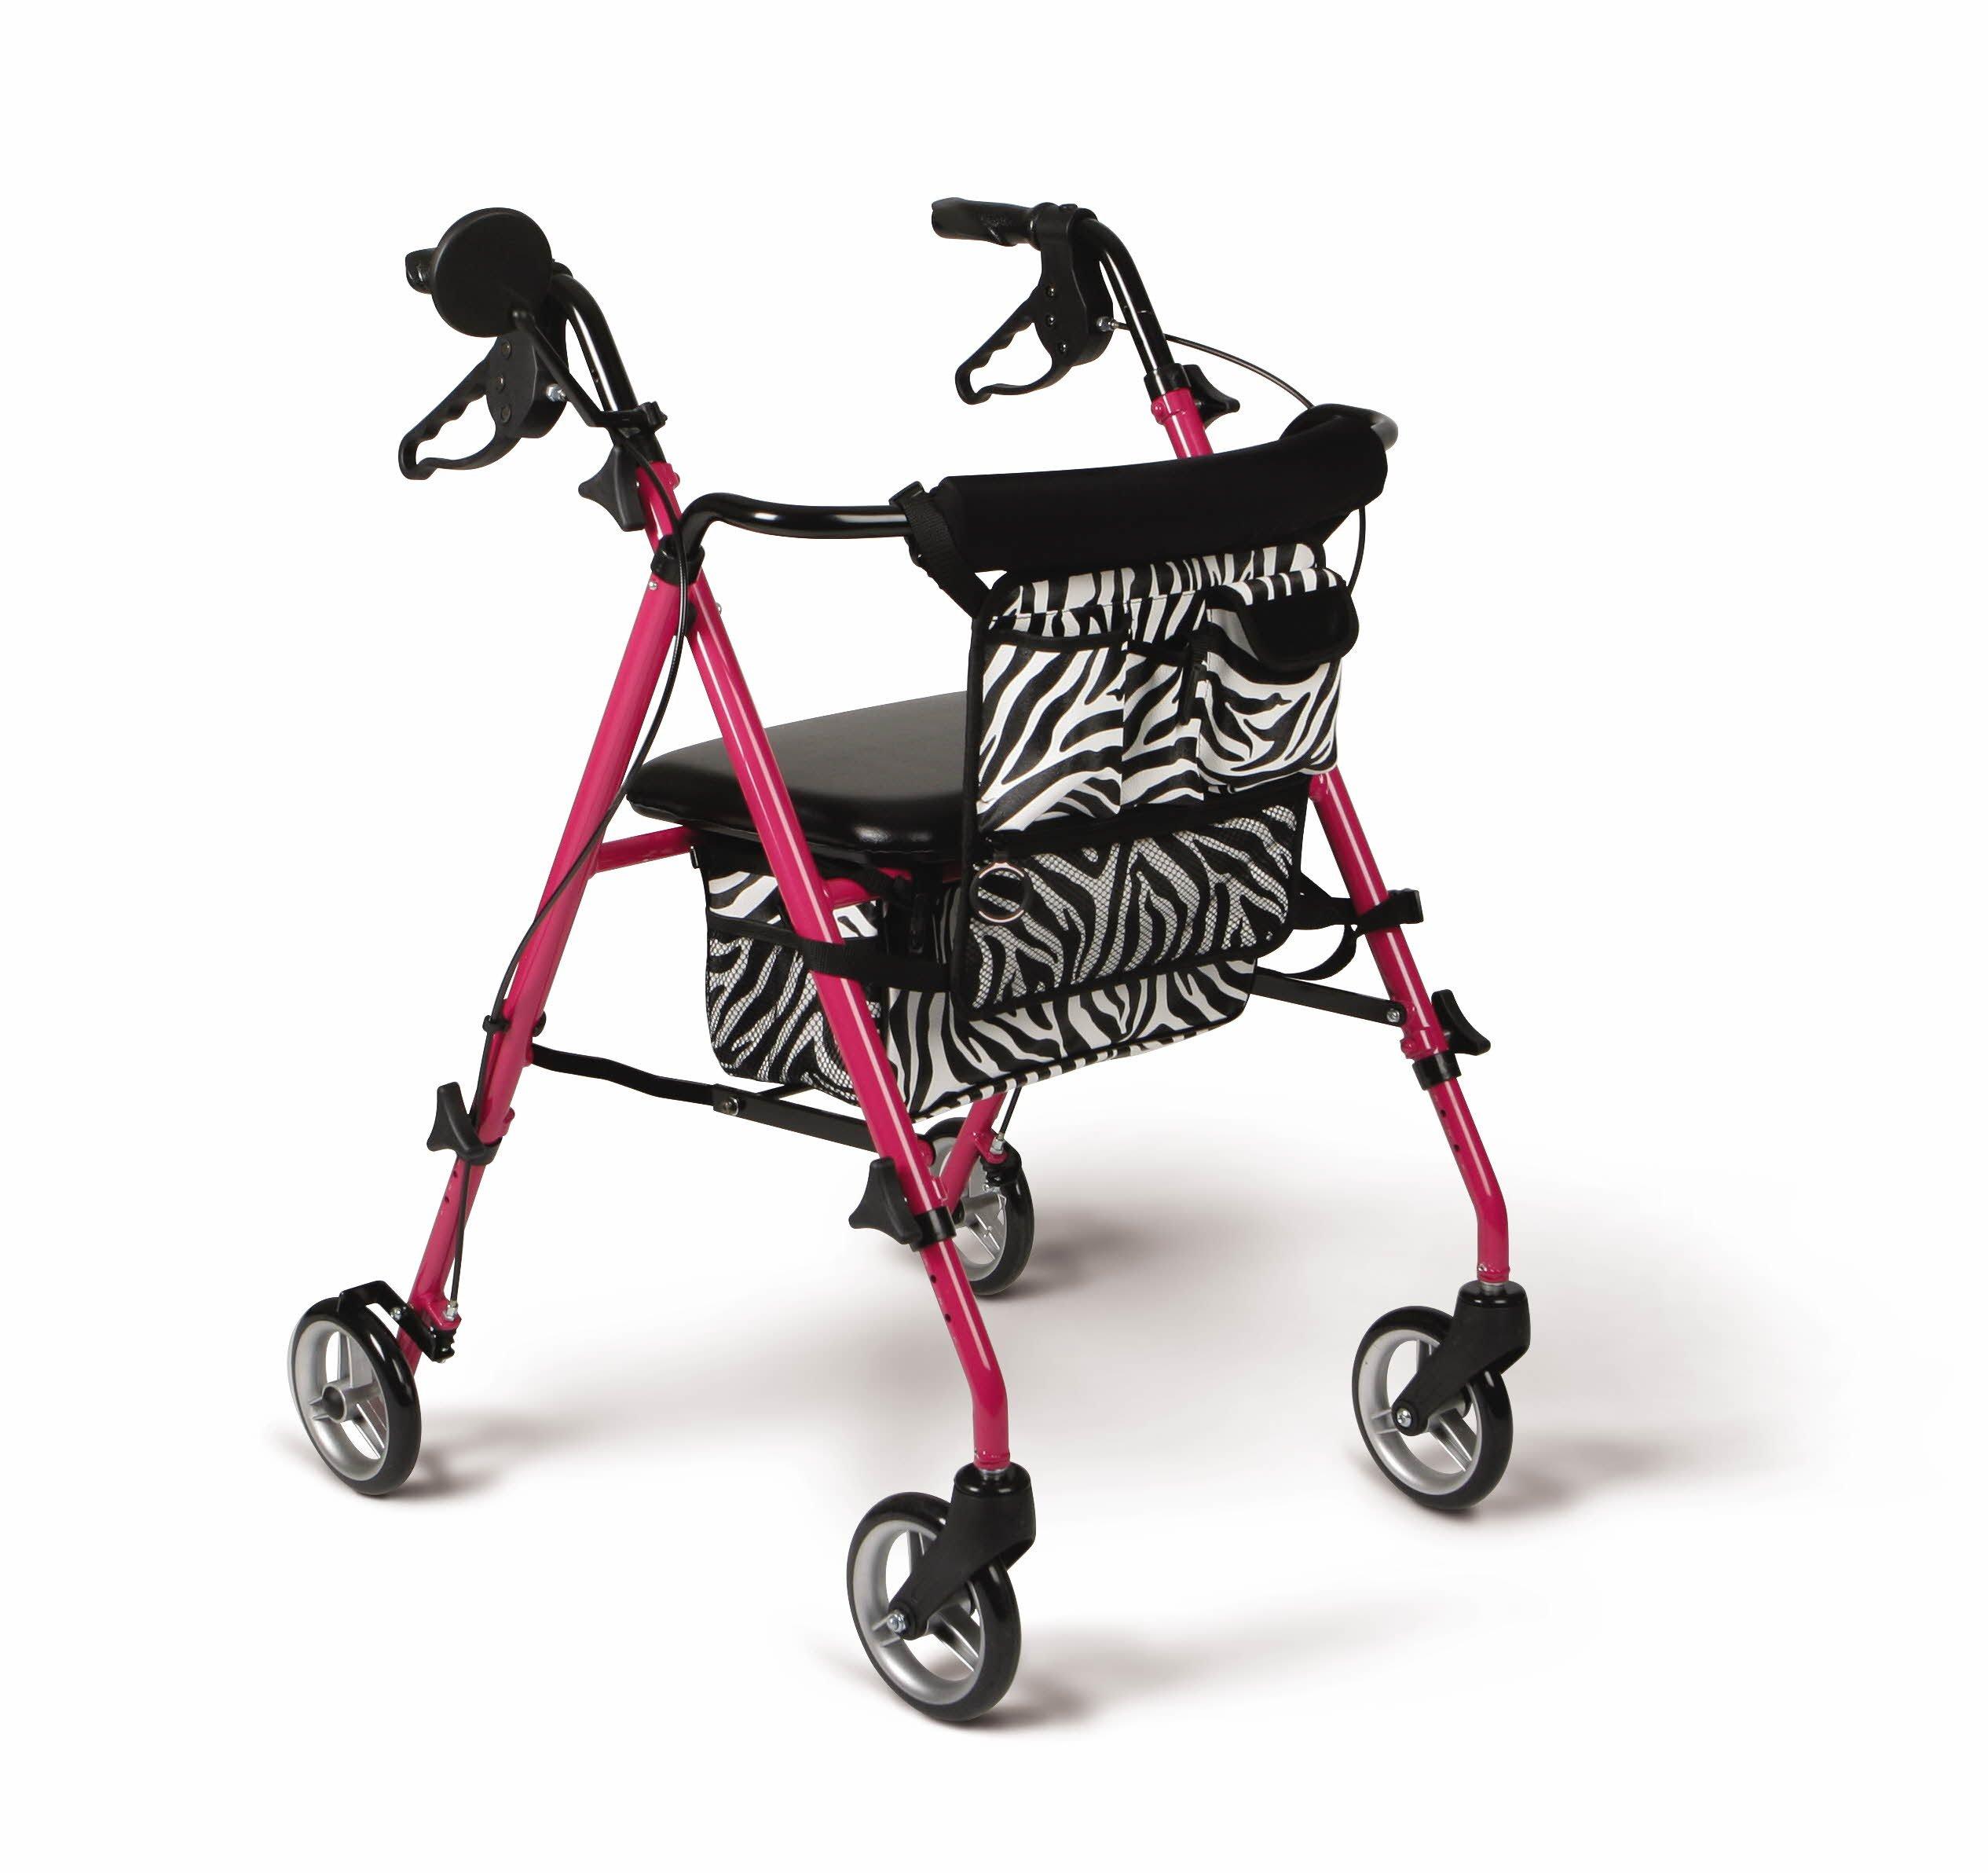 Medline Posh Premium Lightweight Foldable Aluminum Rollator Walker with 6 Inch Wheels, Pink by Medline